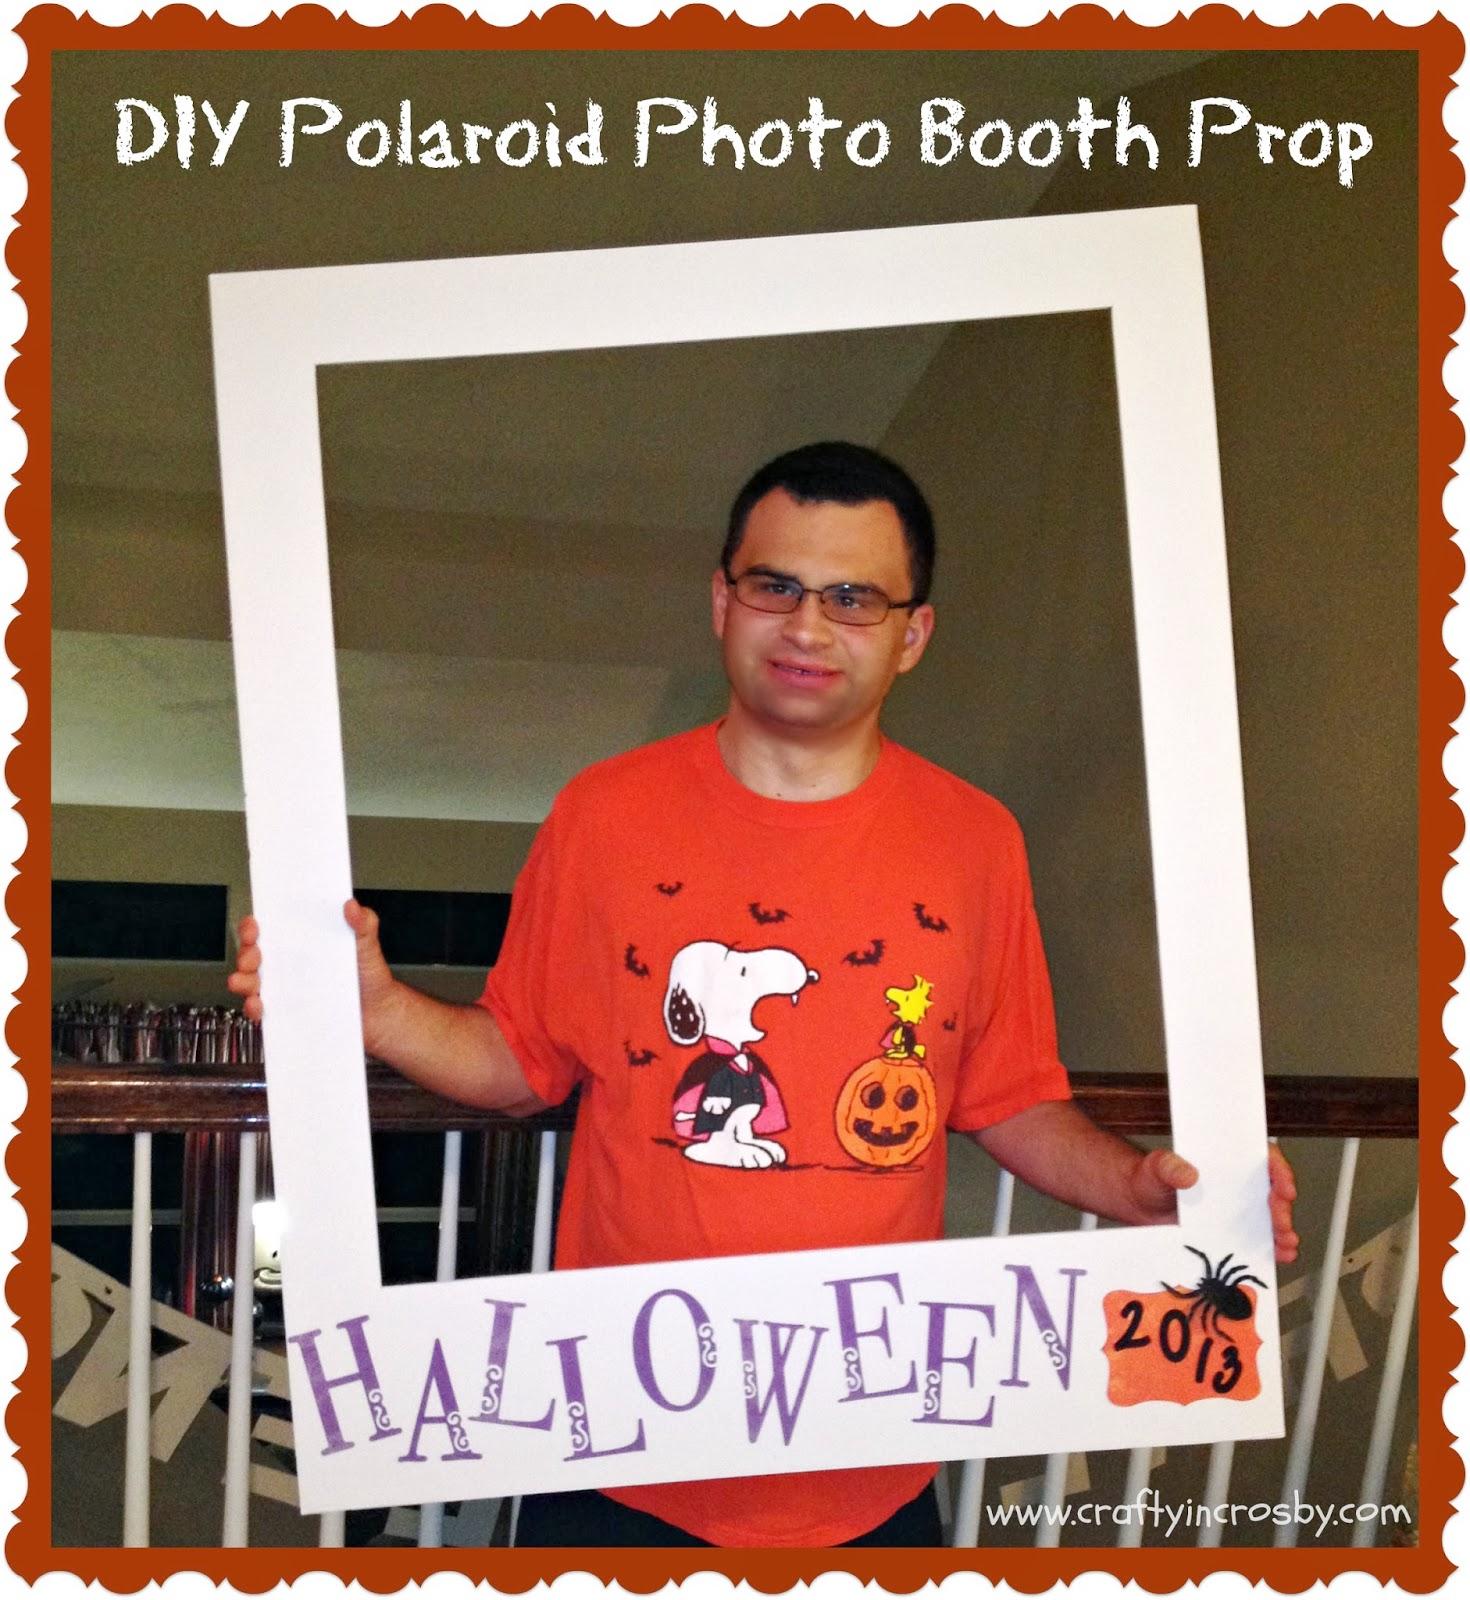 Crafty in Crosby: DIY Polaroid Photo Booth Prop